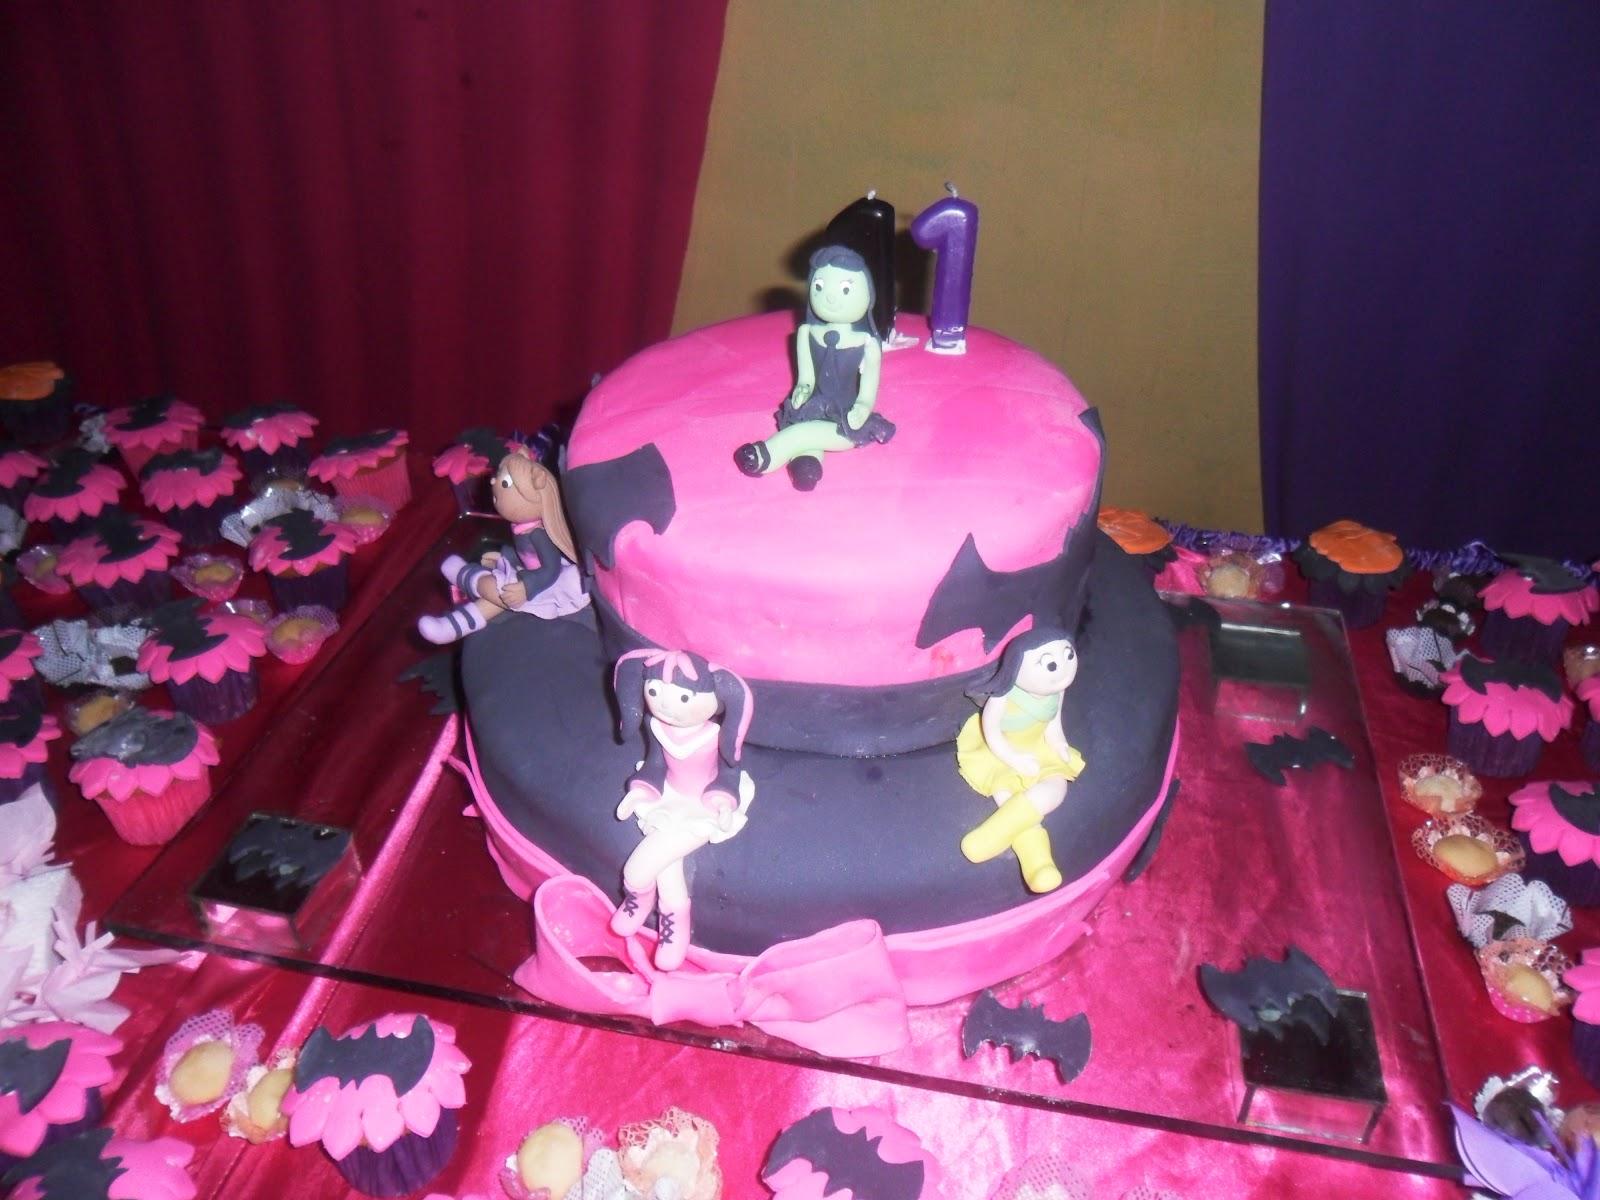 Pleasing Monster High Cakes Decoration Ideas Little Birthday Cakes Personalised Birthday Cards Beptaeletsinfo